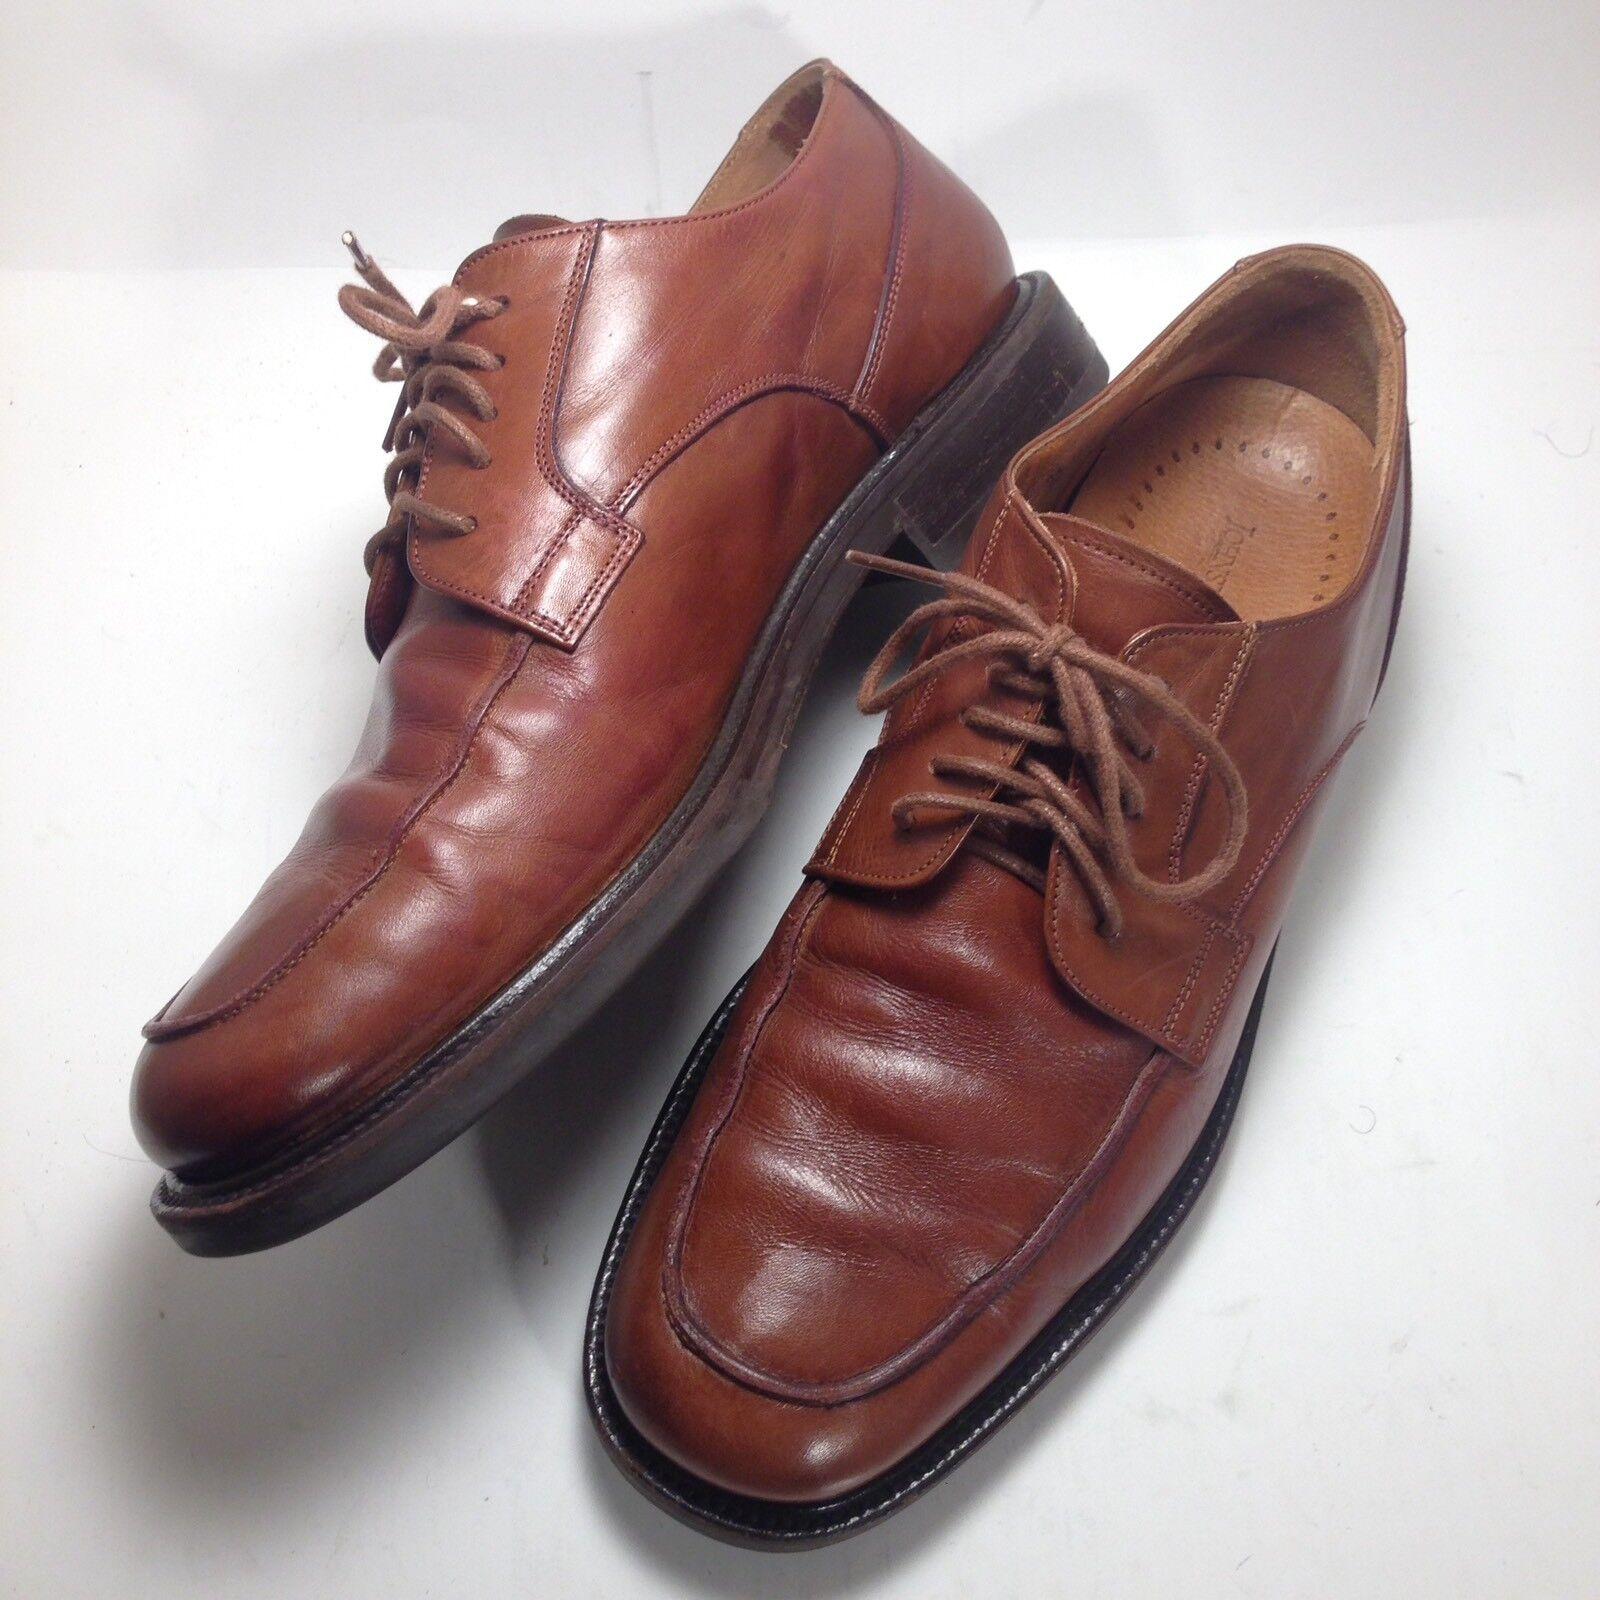 Johnston & Murphy Passport ITALY Brown Leather Italian Oxford Dress shoes Sz 8.5